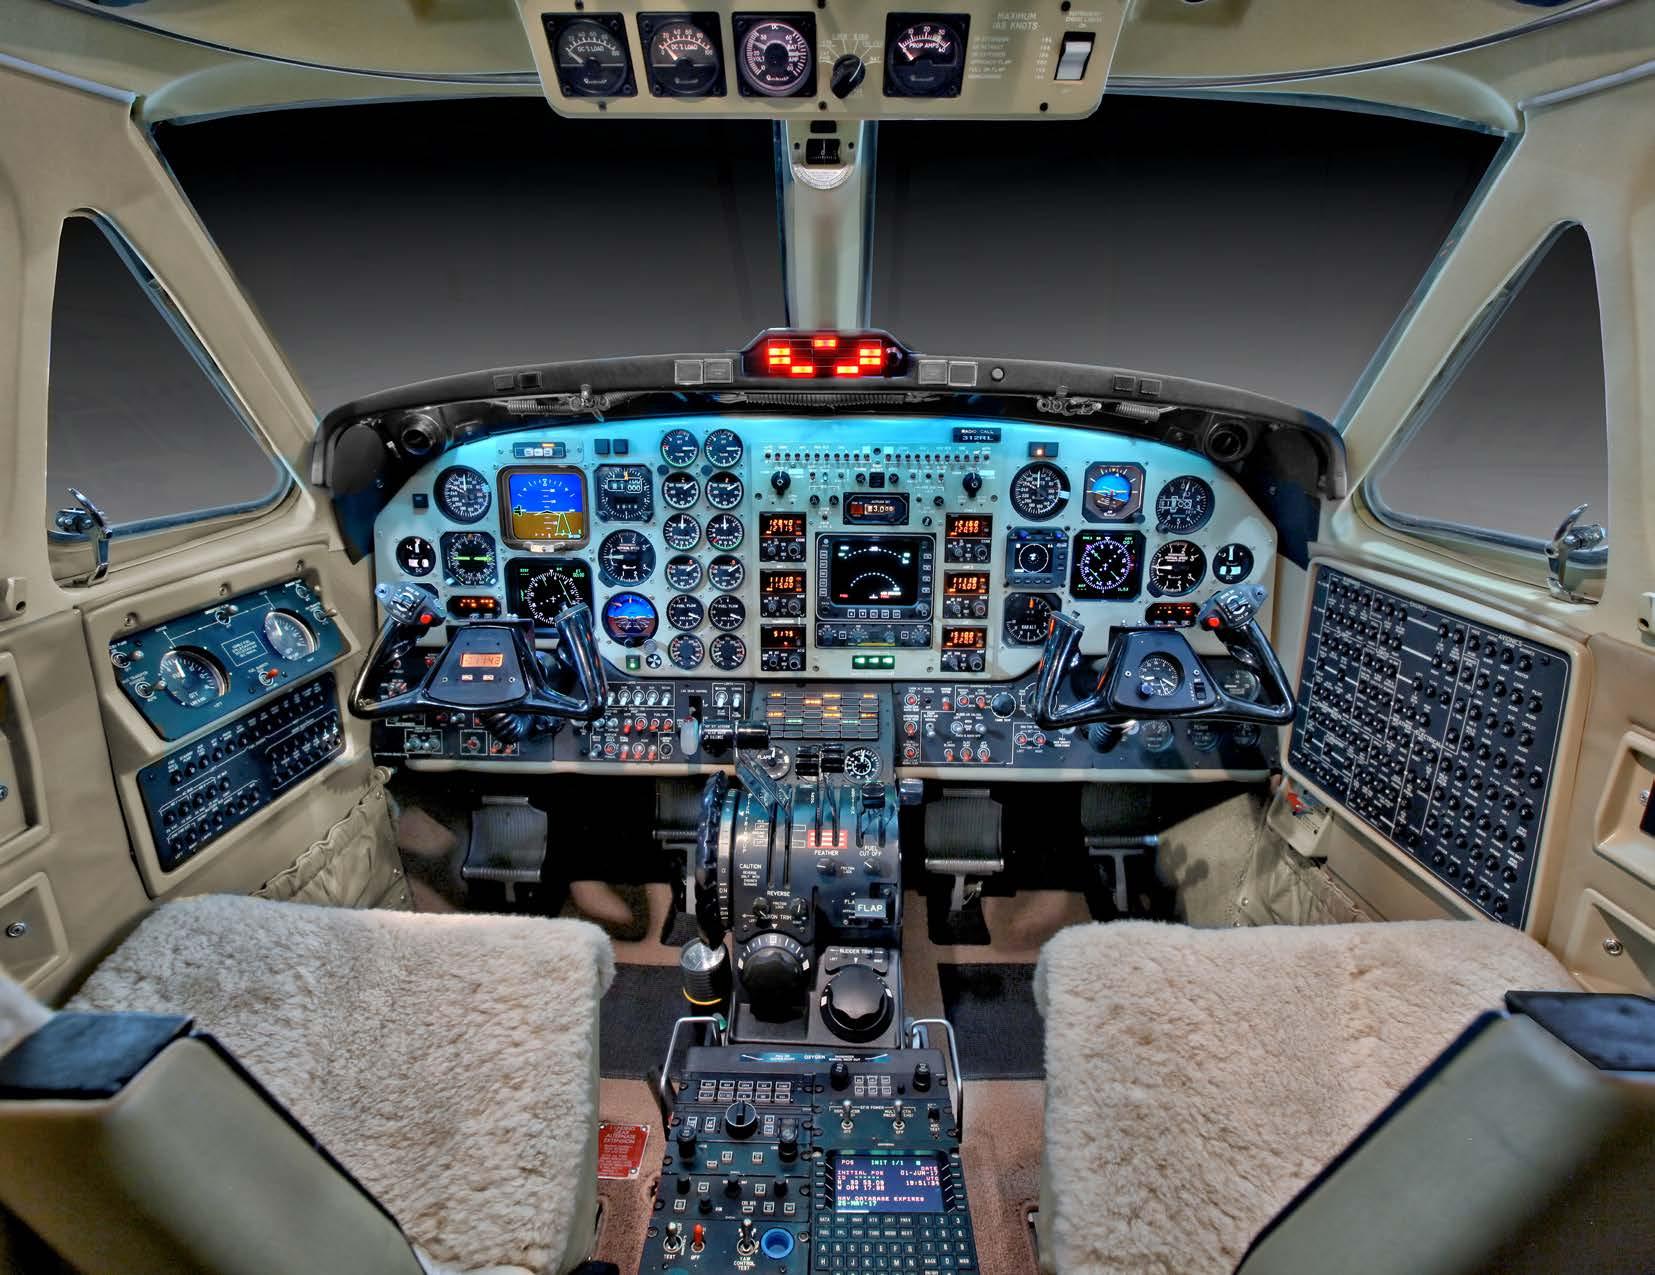 King Air 350 panel